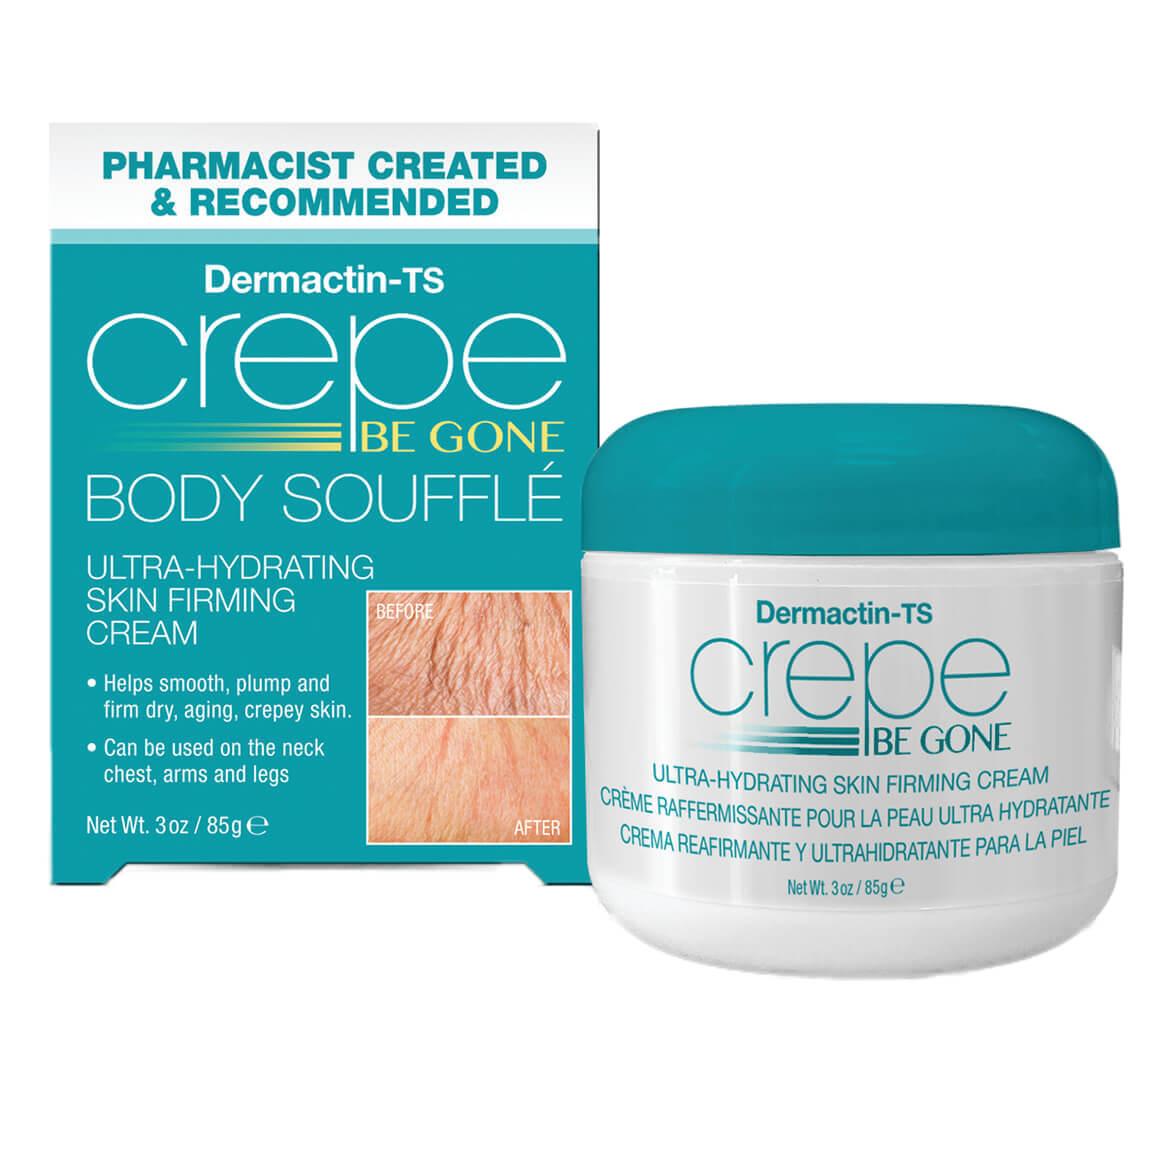 Crepe Be Gone Body Souffle Cream-363030